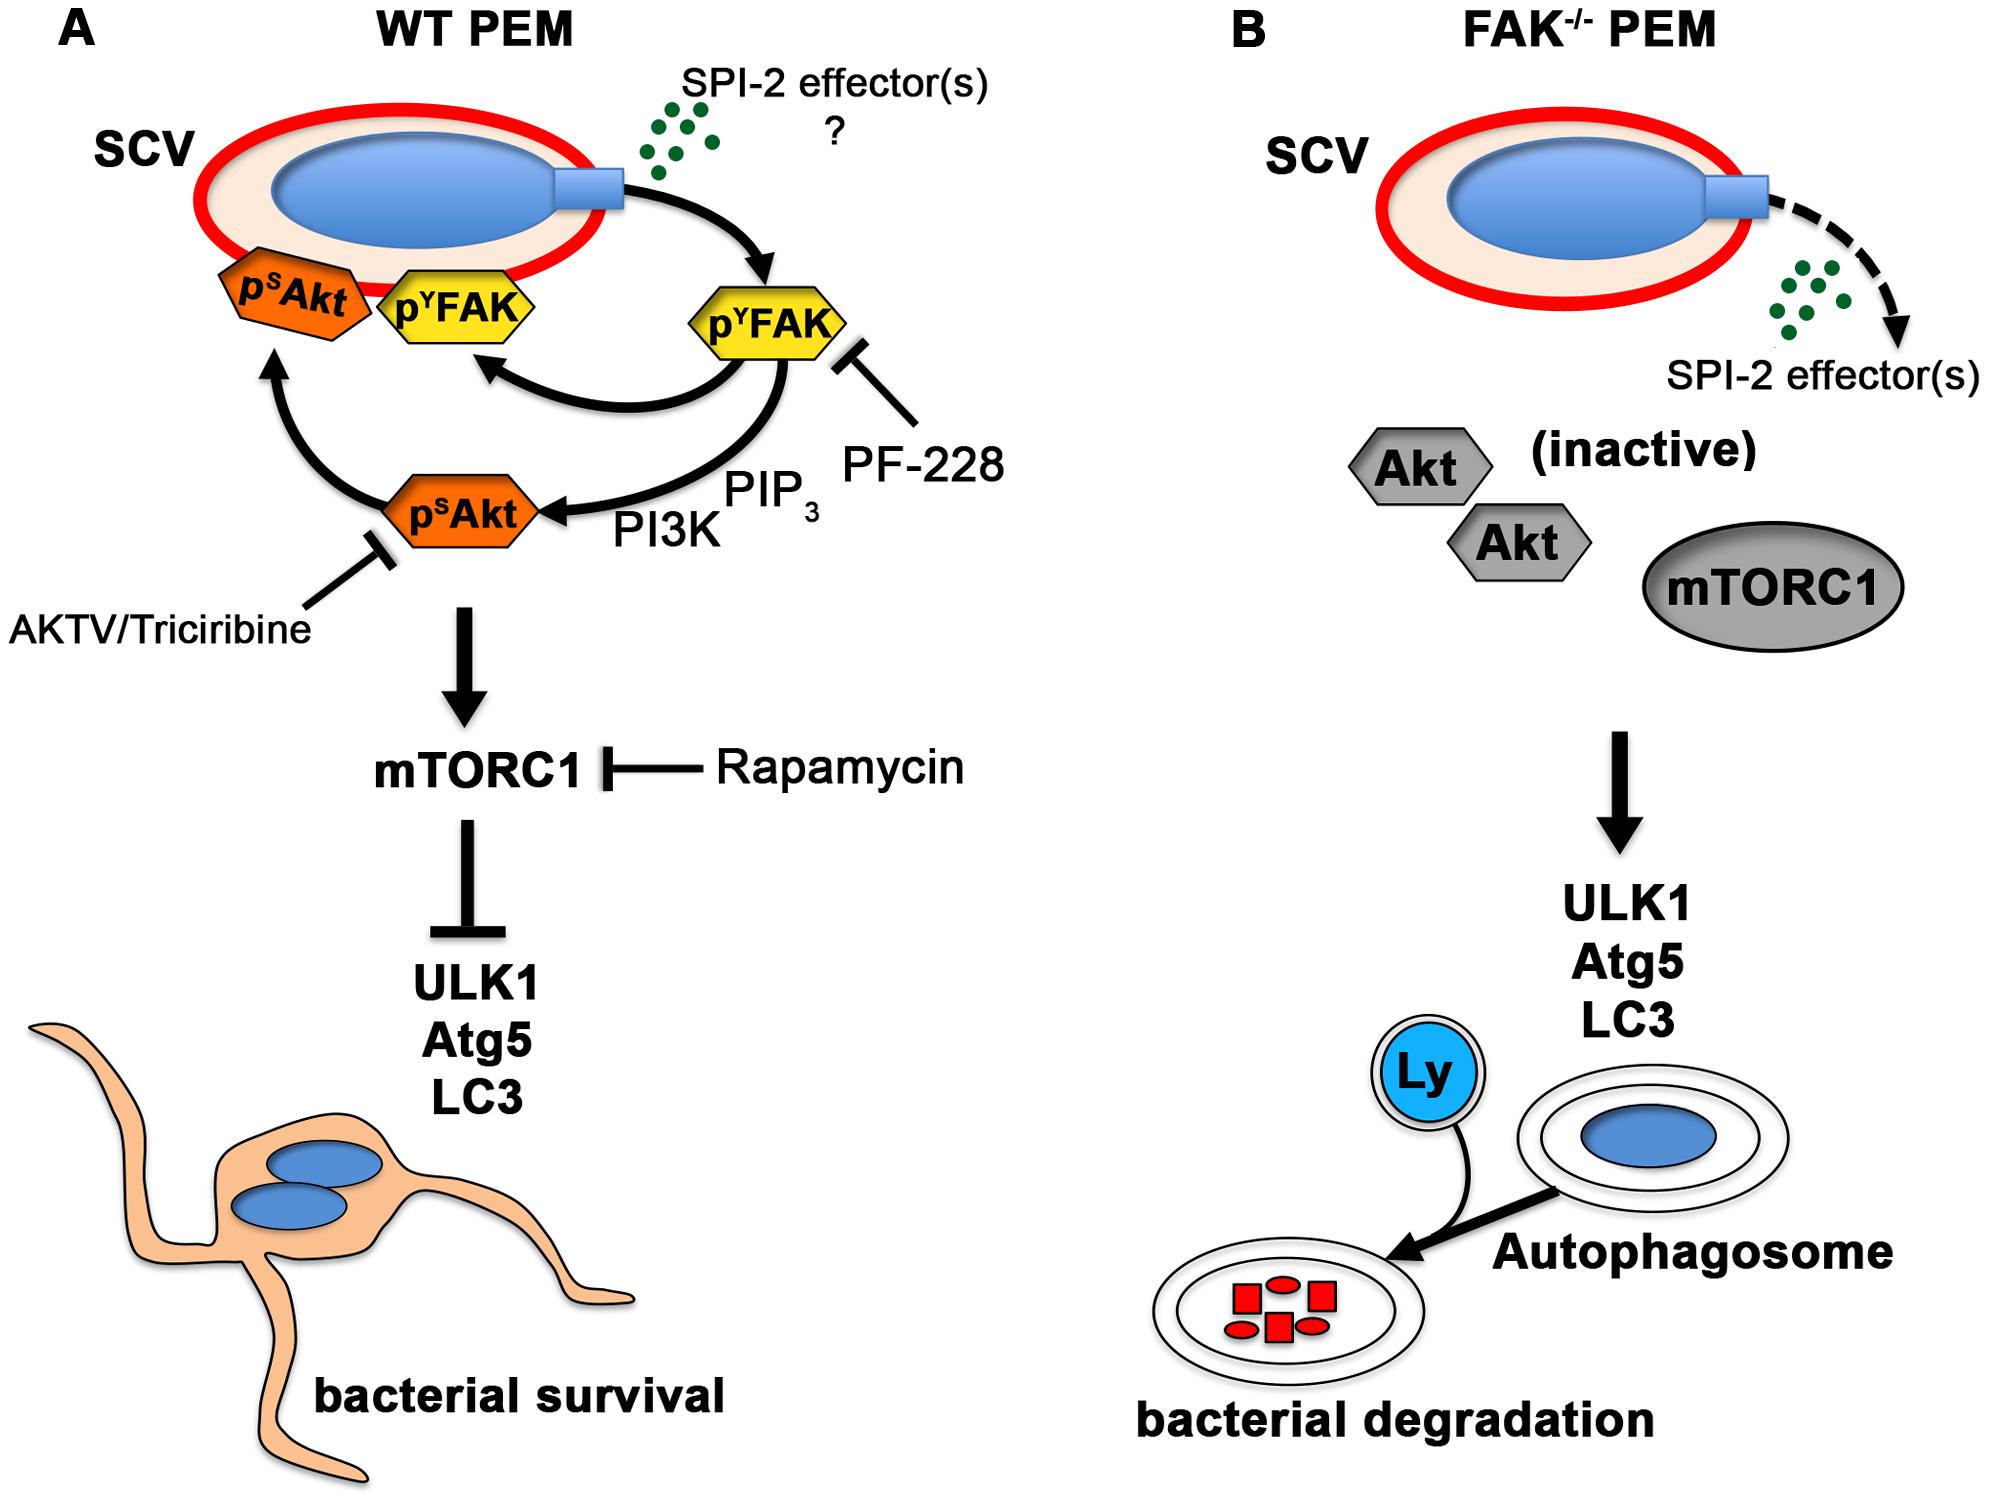 The <i>Salmonella</i> SPI-2 system triggers FAK activation and suppresses the autophagic capture of intracellular <i>Salmonella</i>.